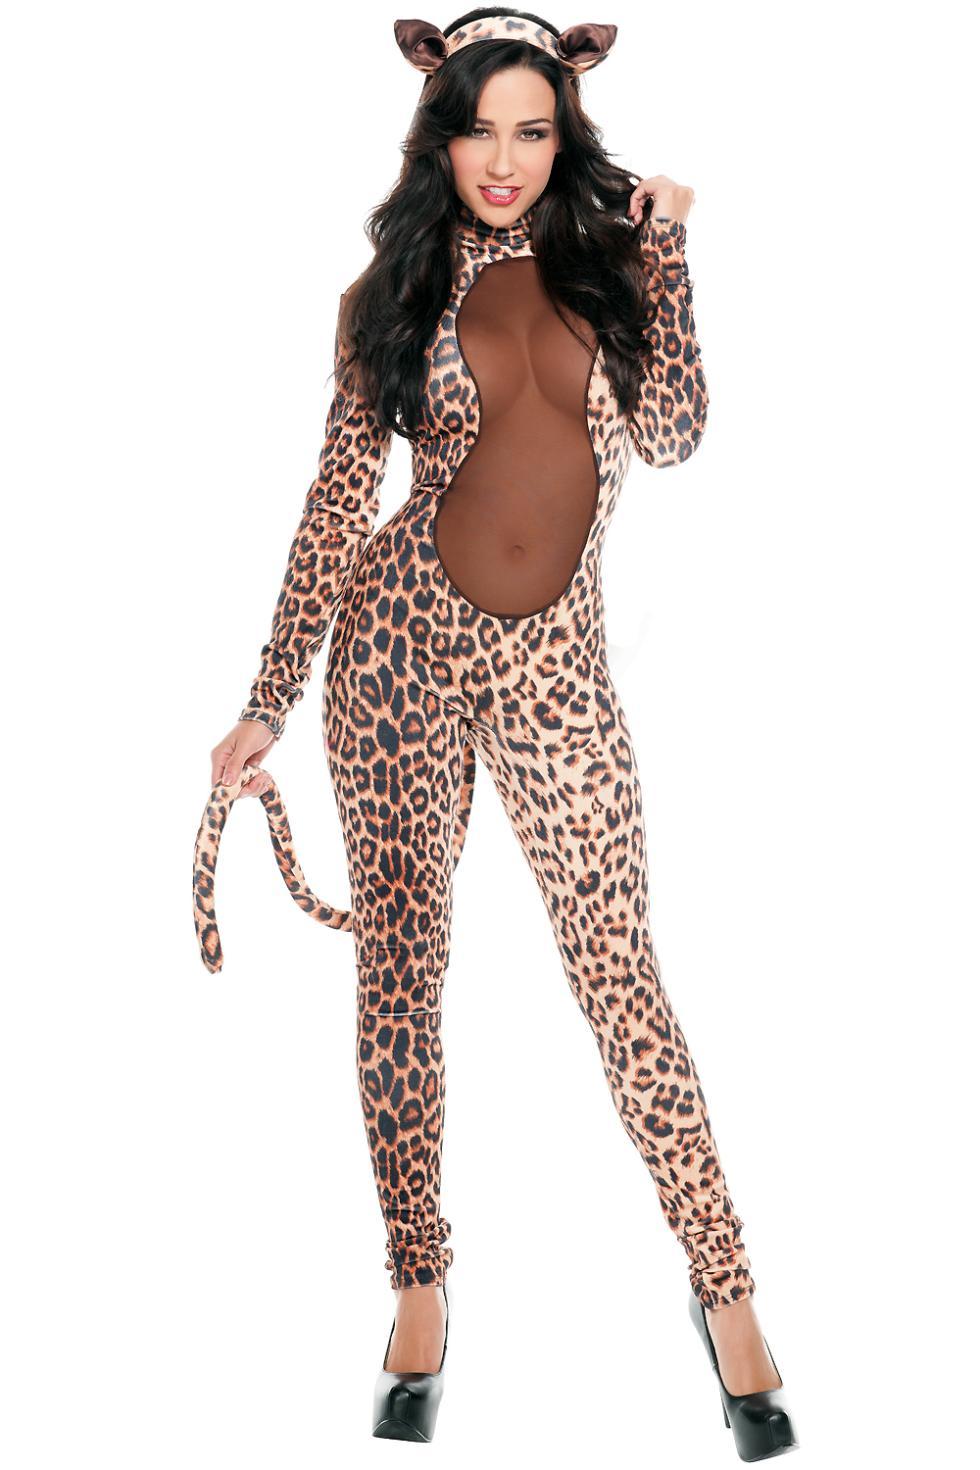 fantasias costumes  Womens Starline Kitty Costume LC8754  Rompers Jumpsuit women  Casual macacao feminino new 2015(China (Mainland))